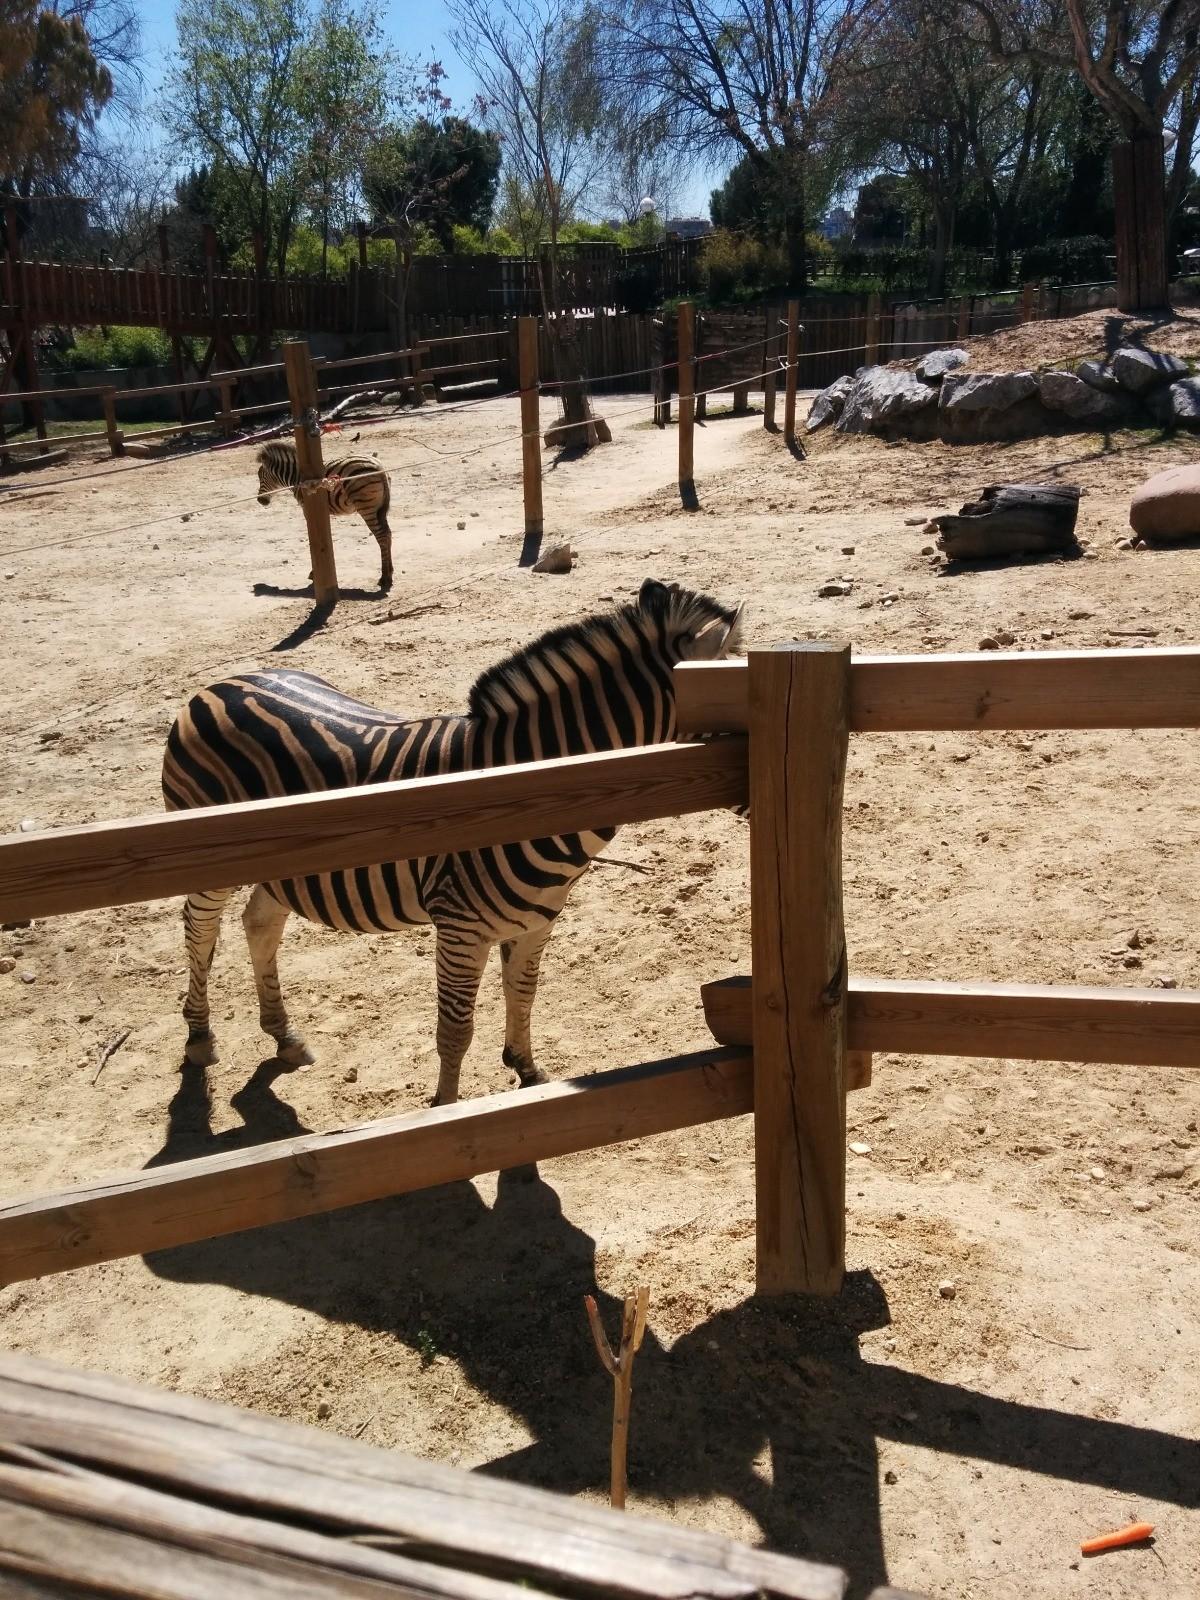 el-zoo-madrid-900c5d4f34afc6413b043b3770